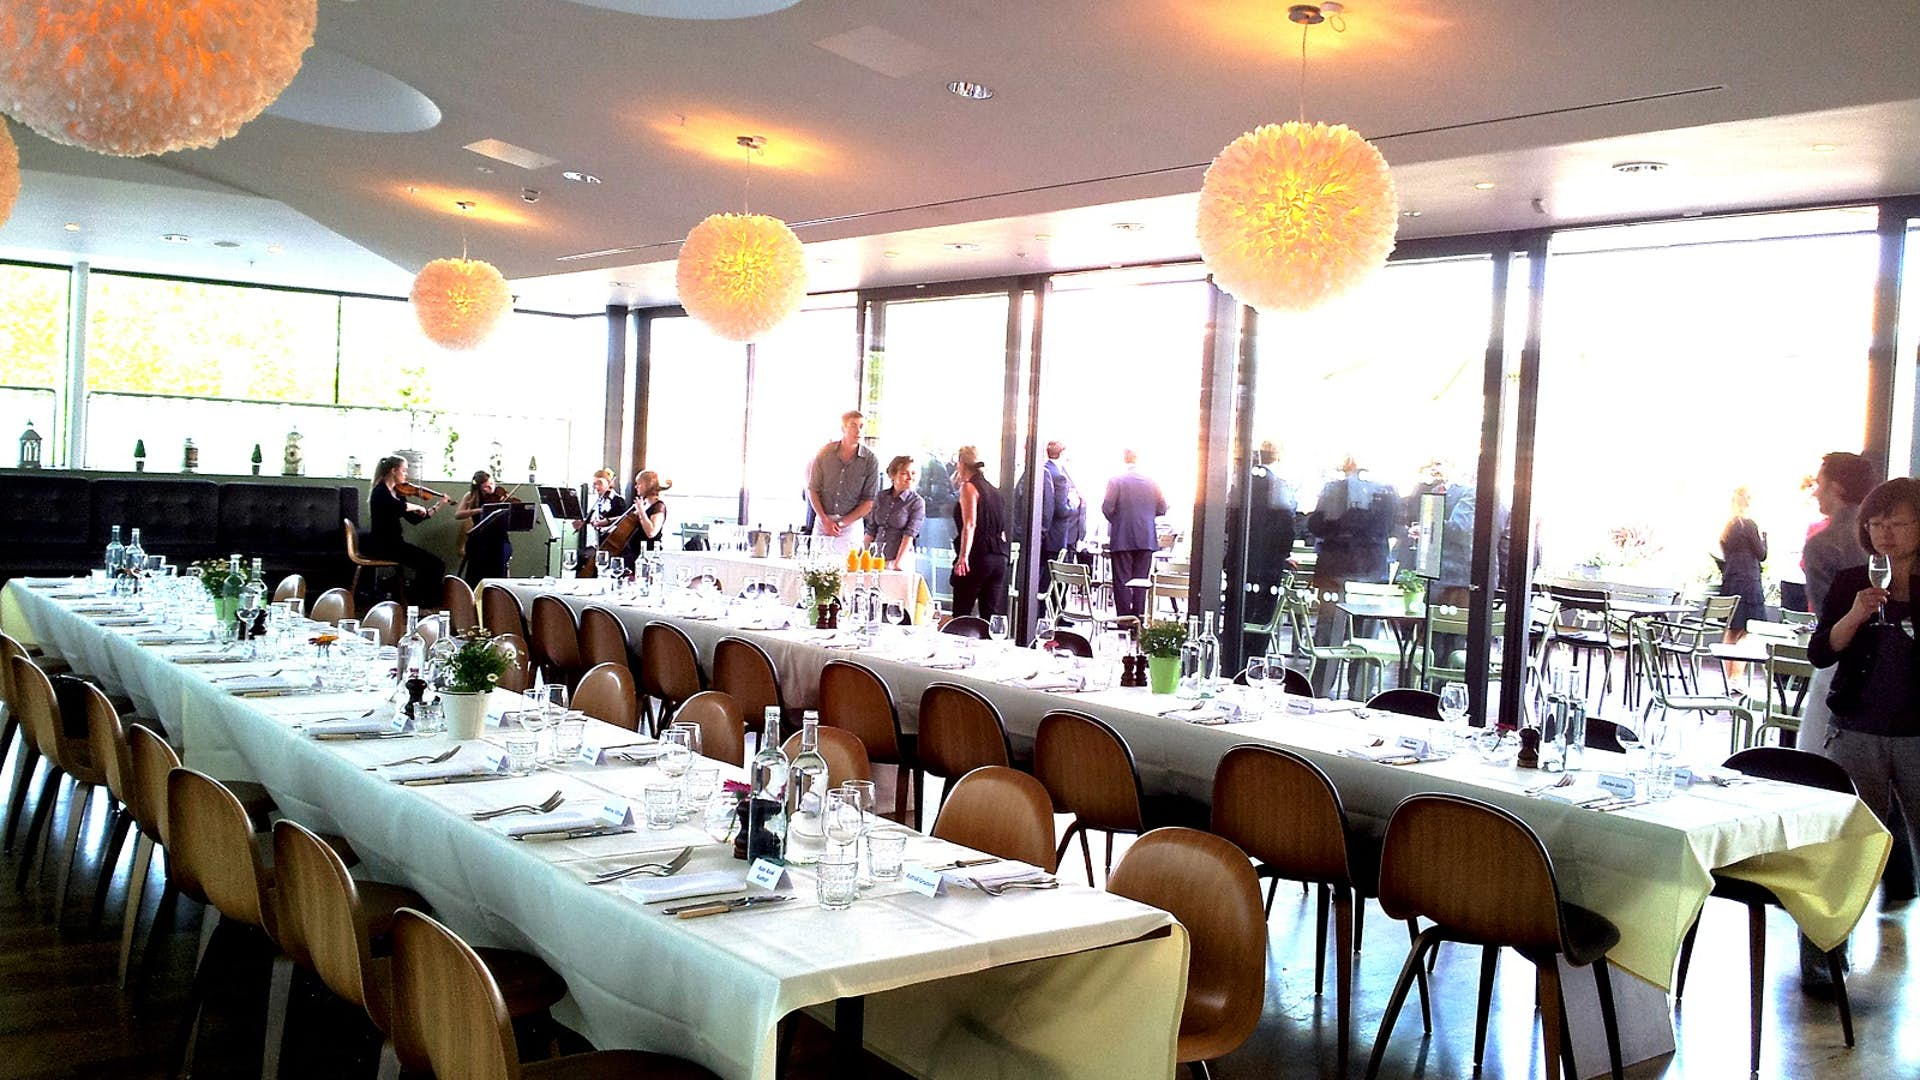 Ashmolean Dining Room